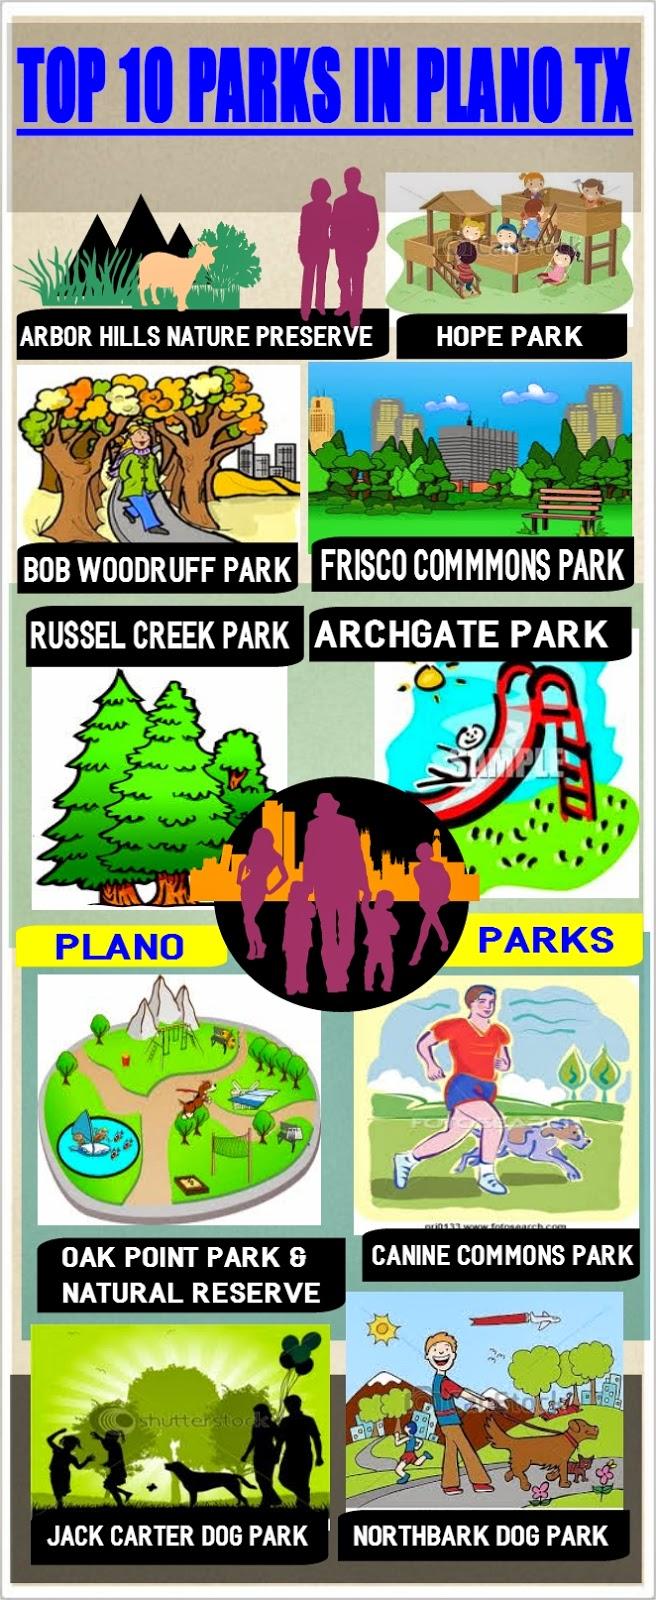 Top Parks Plano Texas